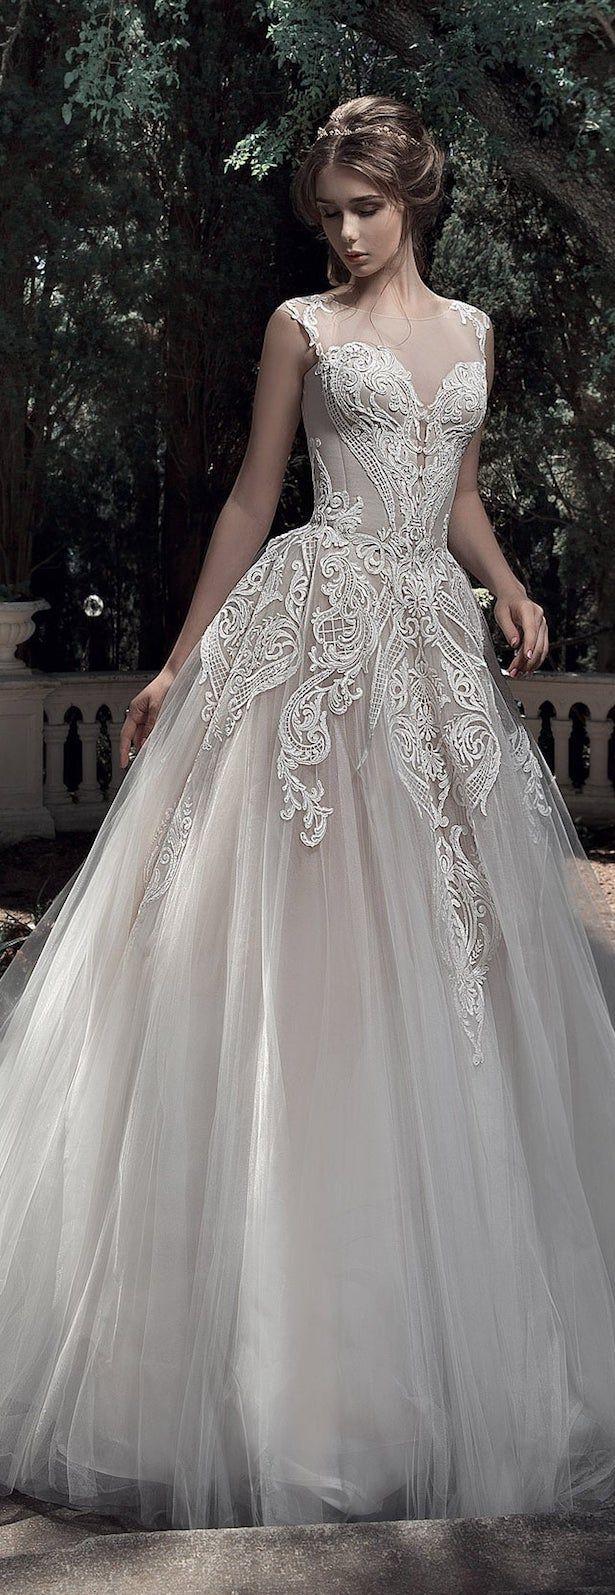 Milva 2017 Wedding Dresses – Sunrise Collection....absolutely beautiful!!